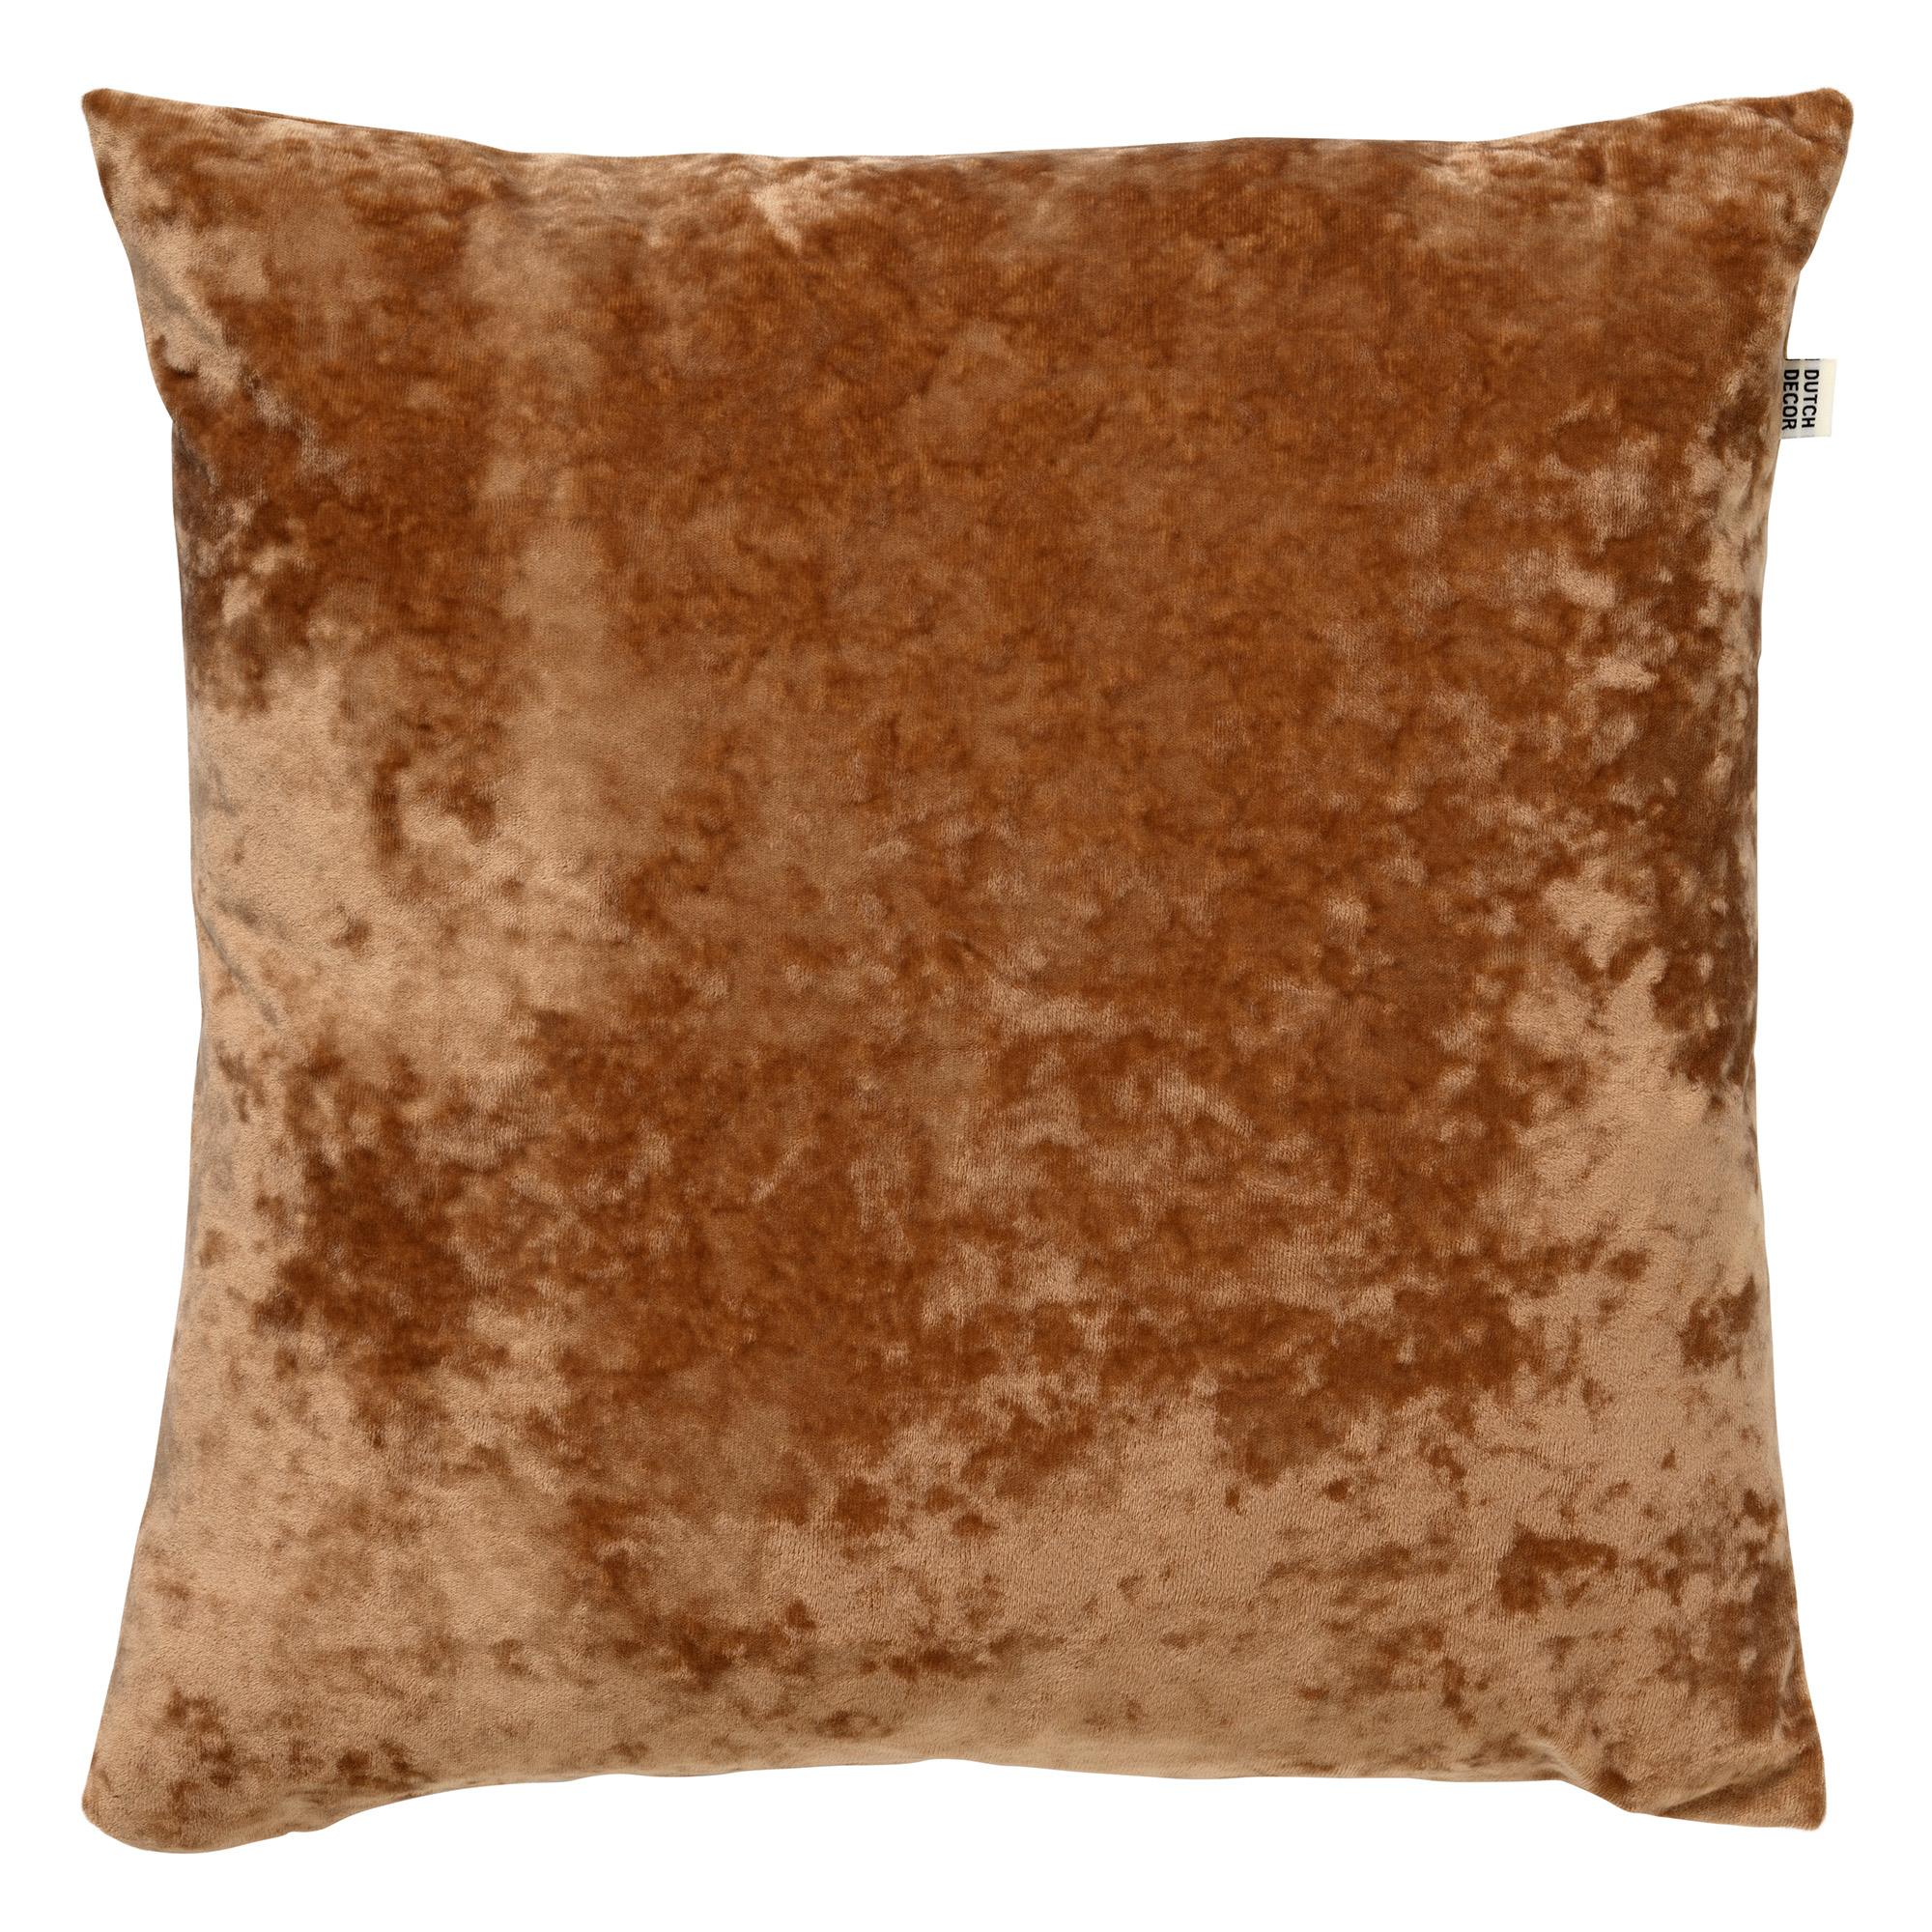 SKY - Sierkussen velvet Tobacco Brown 45x45 cm